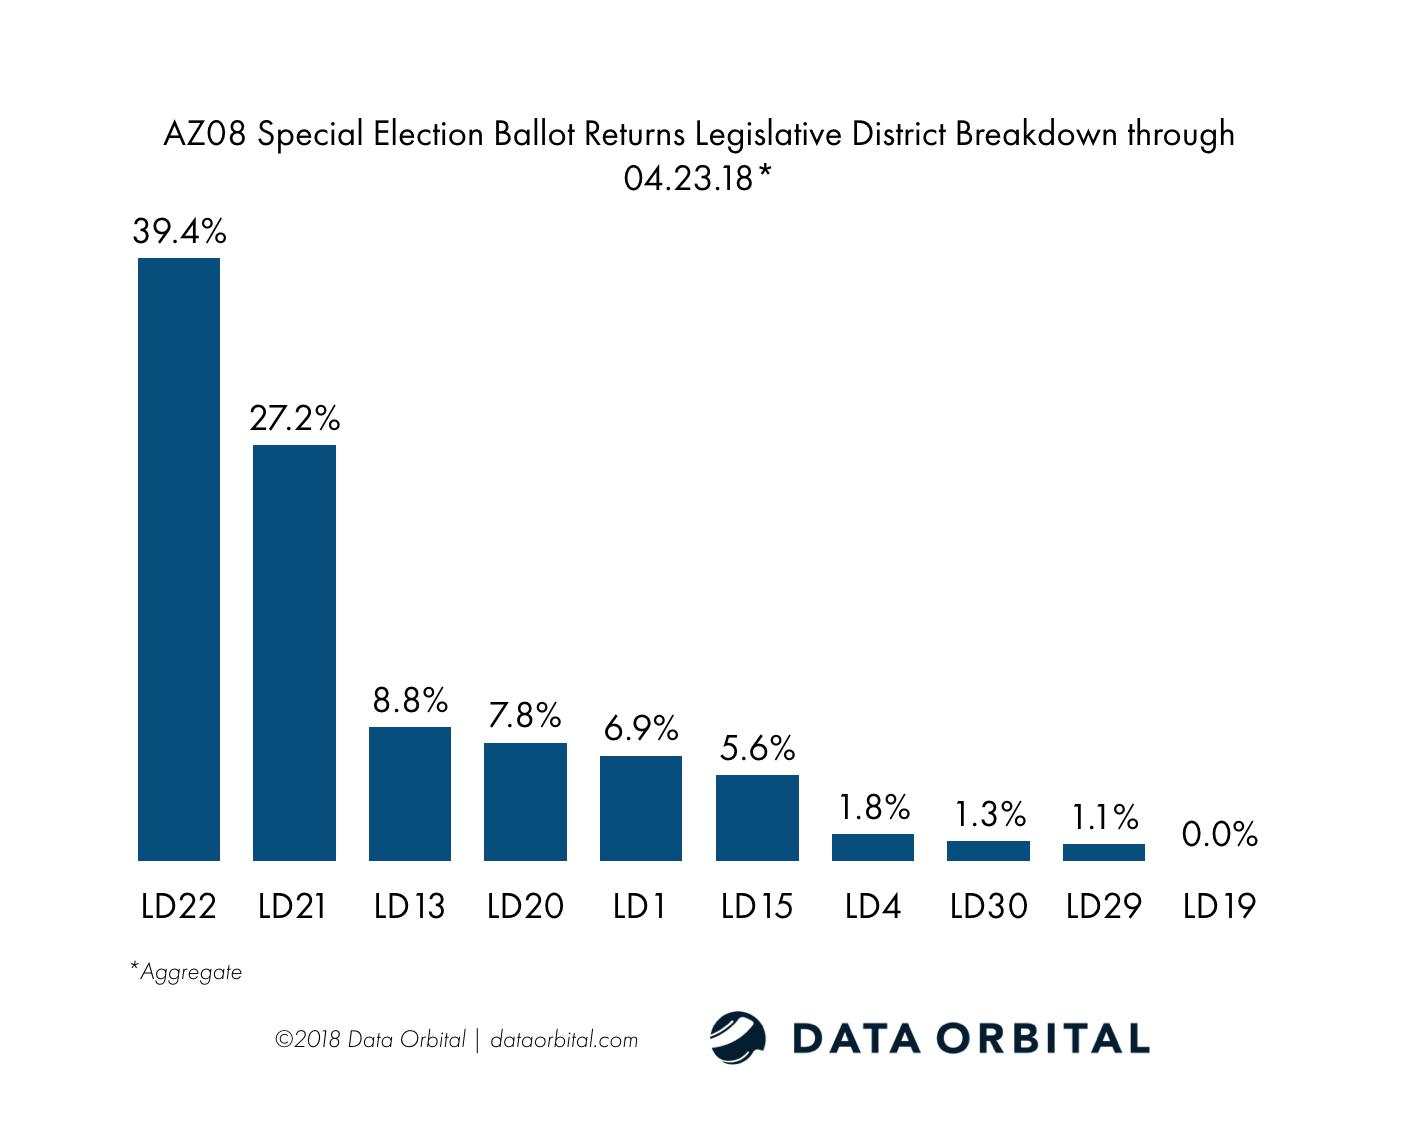 AZ08 Special Election Ballot Returns 04.23.18 Legislative District